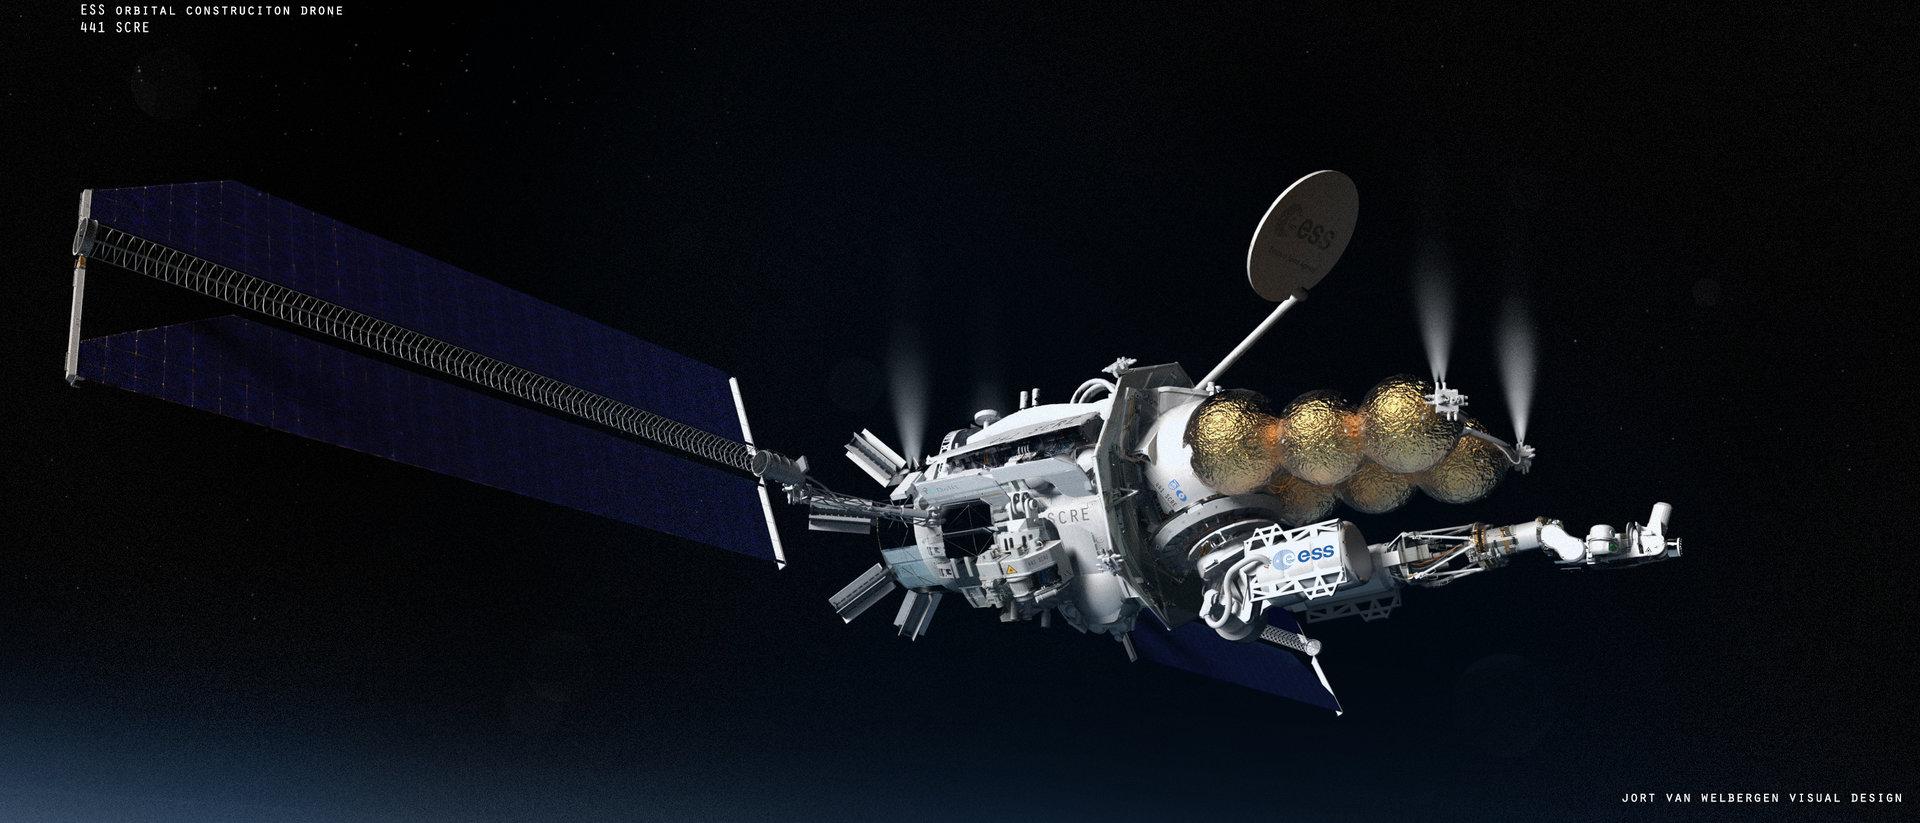 ESS Orbital Construction Drone 441 SCRE